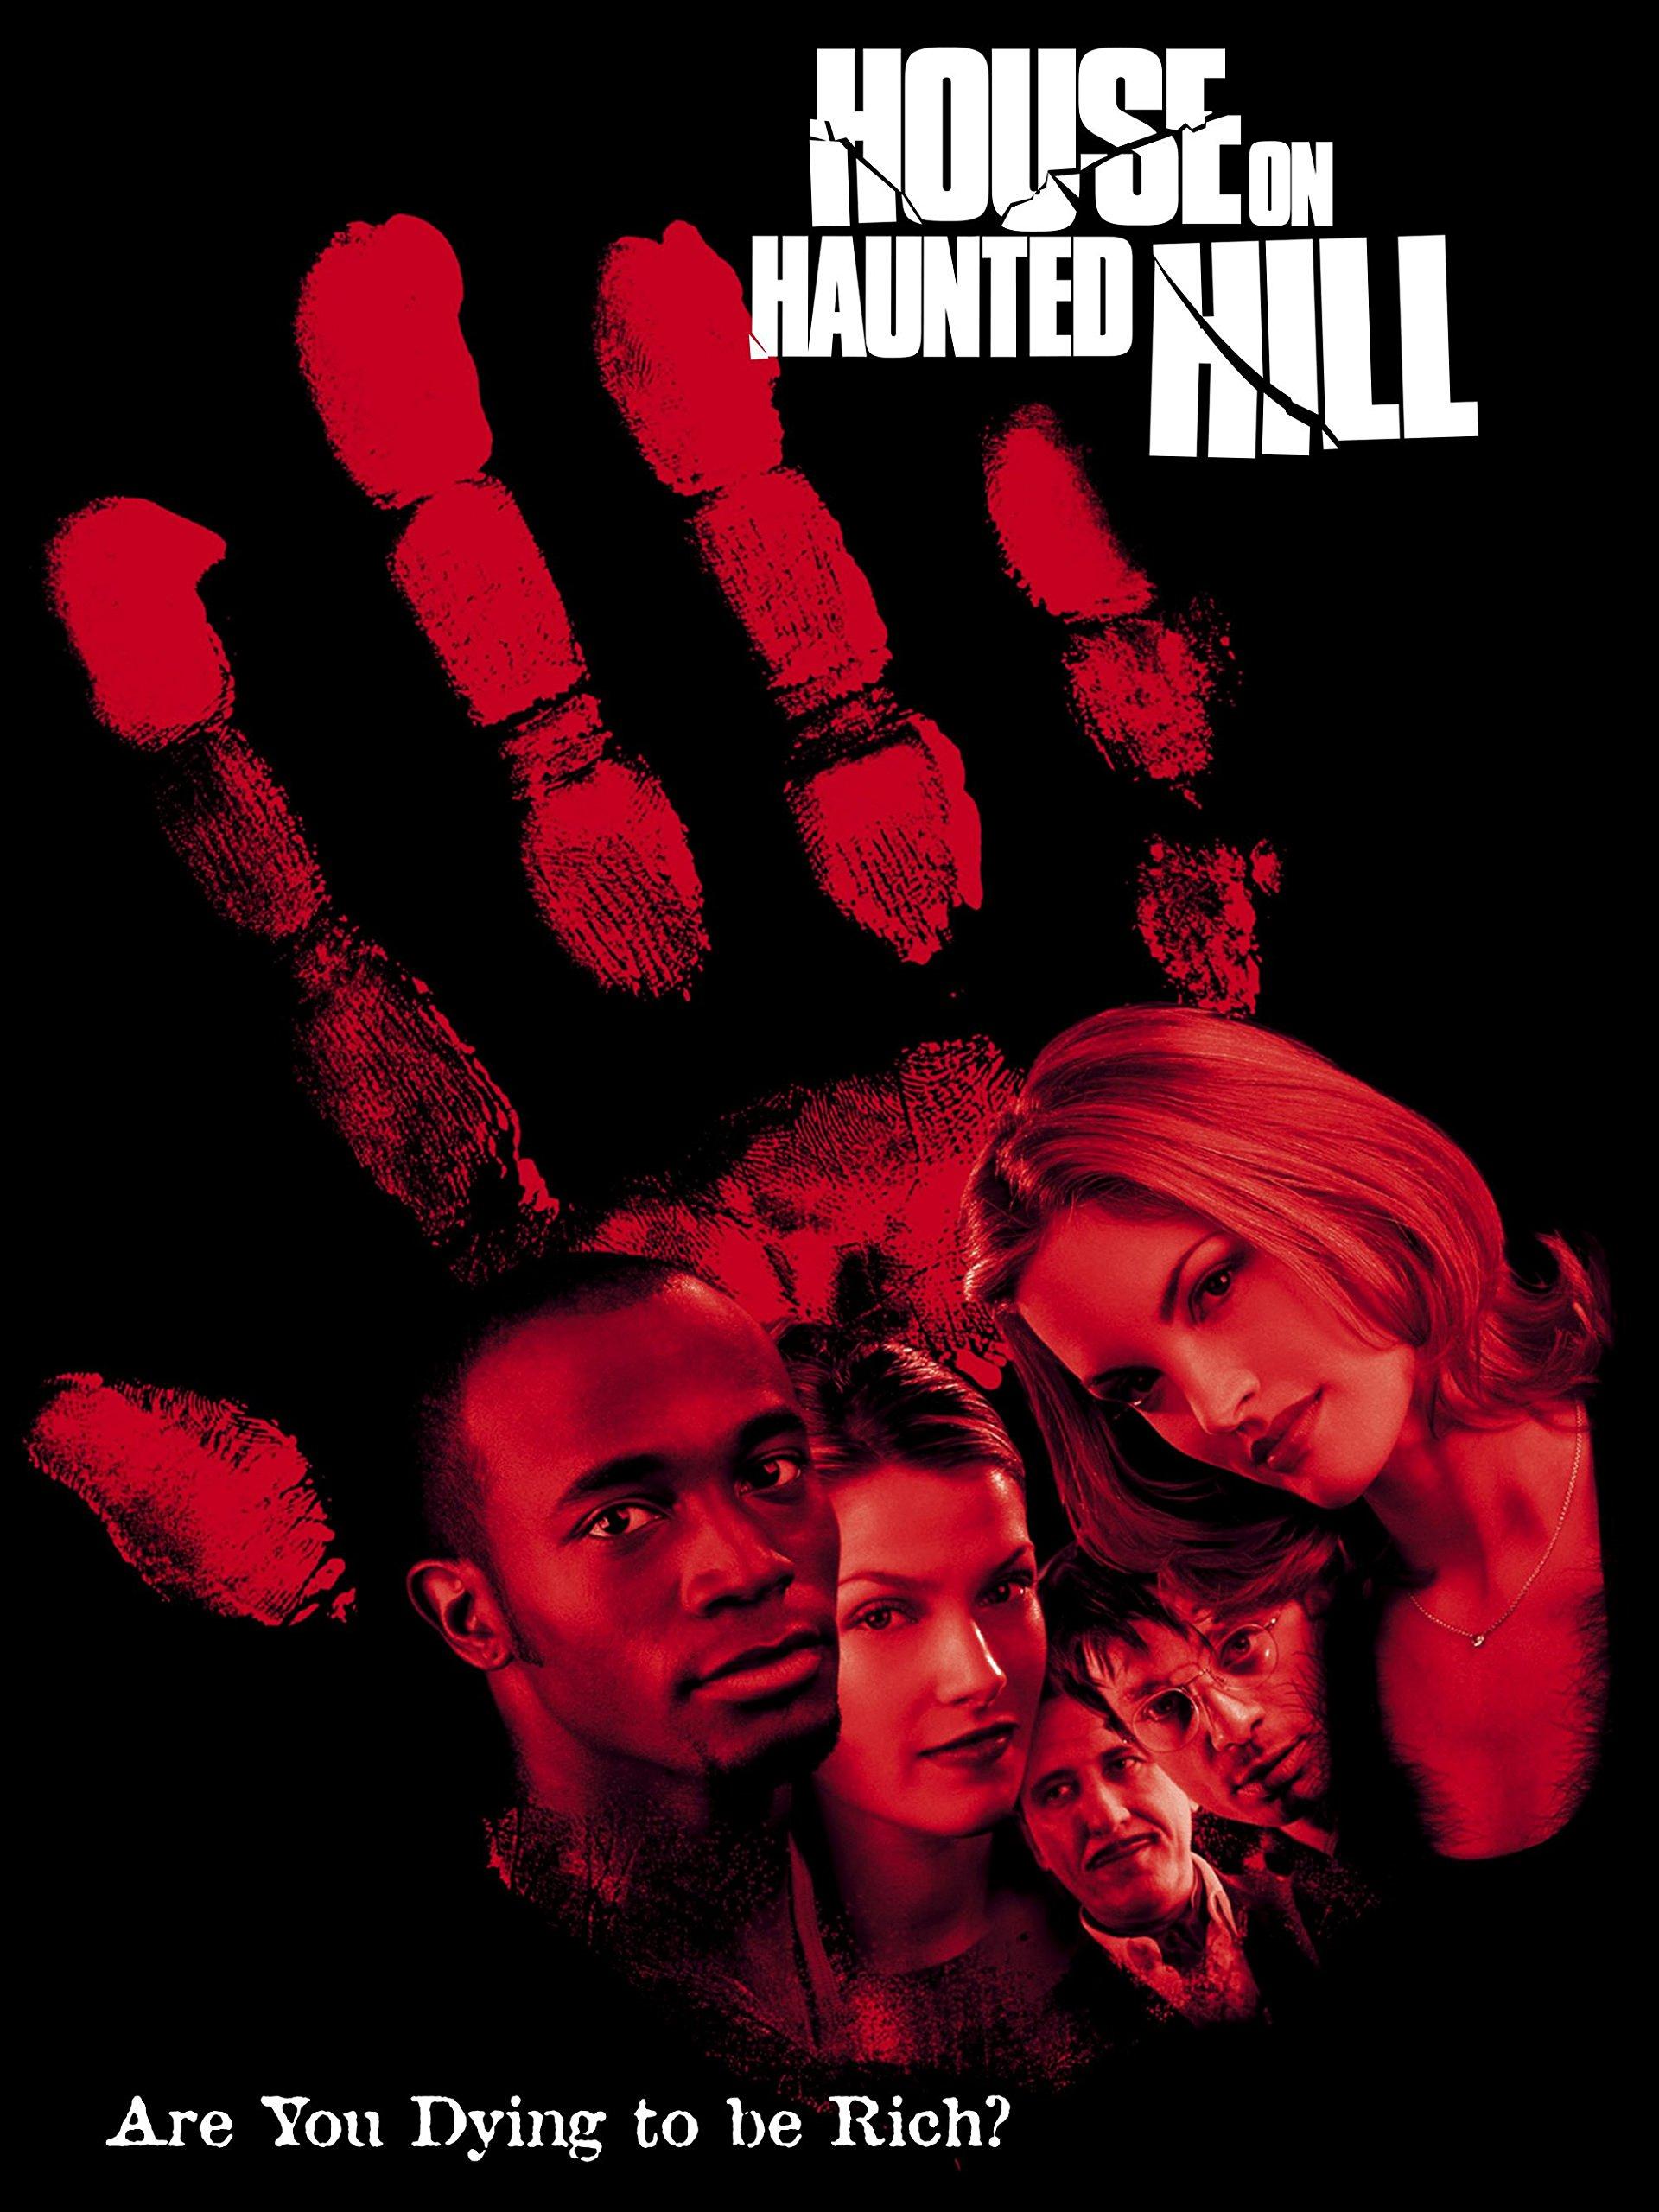 Amazon.com: House On Haunted Hill (1999): Geoffrey Rush, Famke Janssen,  Taye Diggs, Ali Larter: Amazon Digital Services LLC